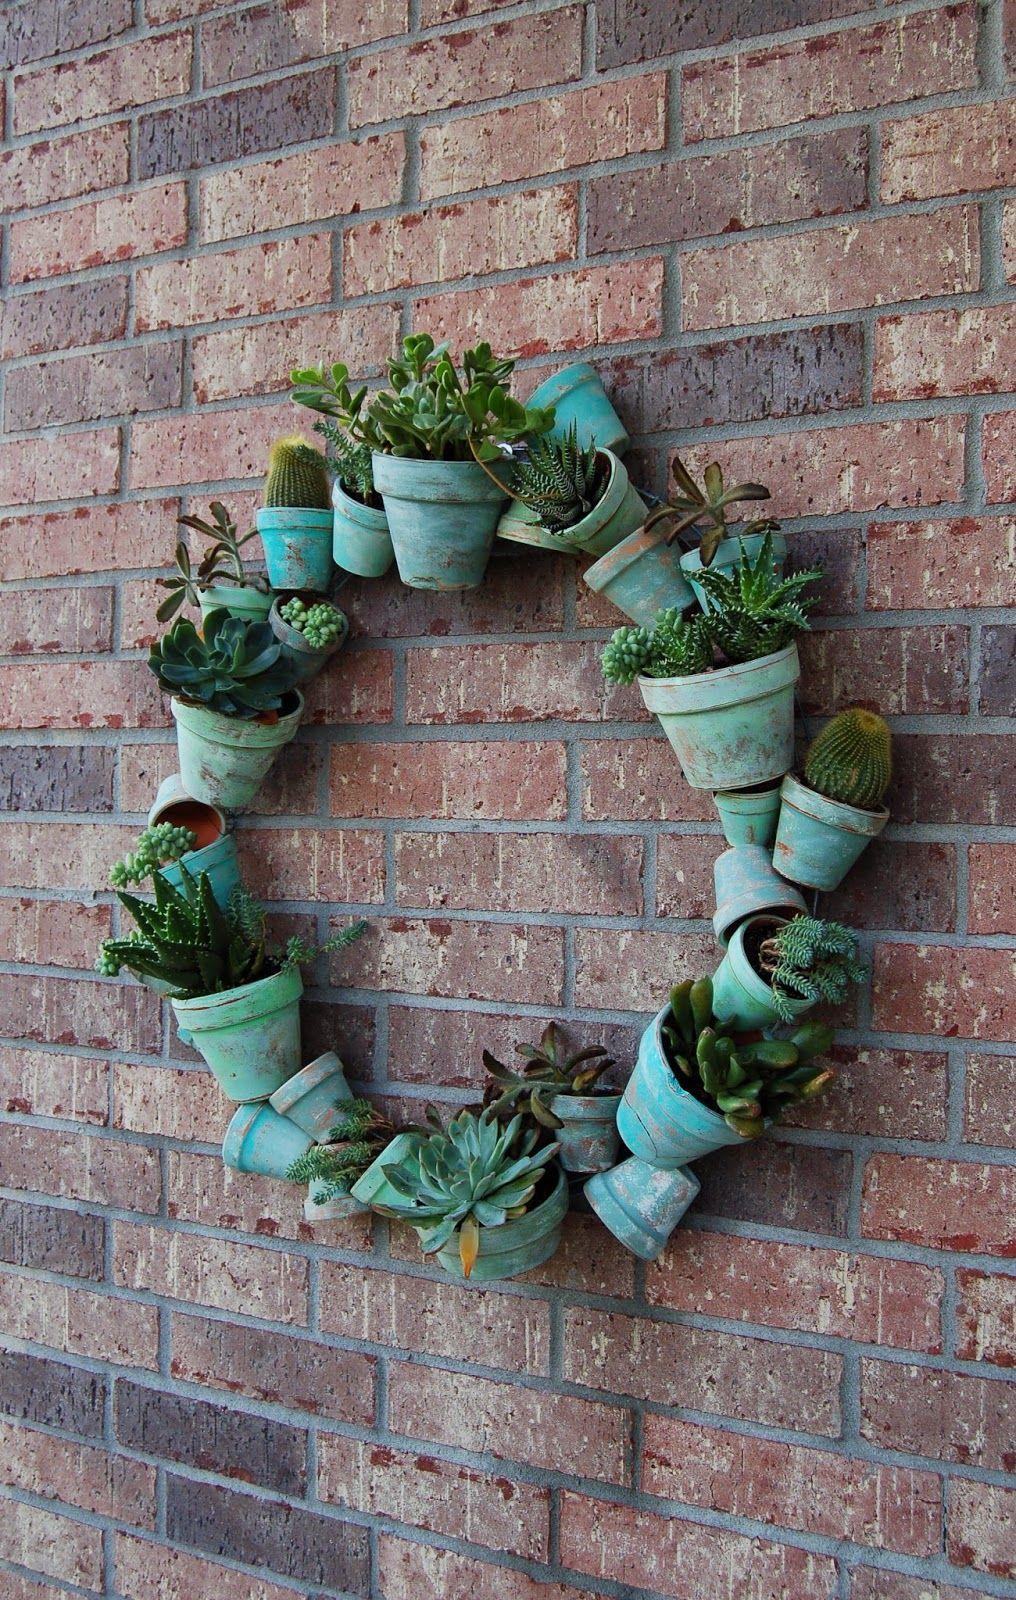 Clay Pot Wreath + Succulents = Smile!